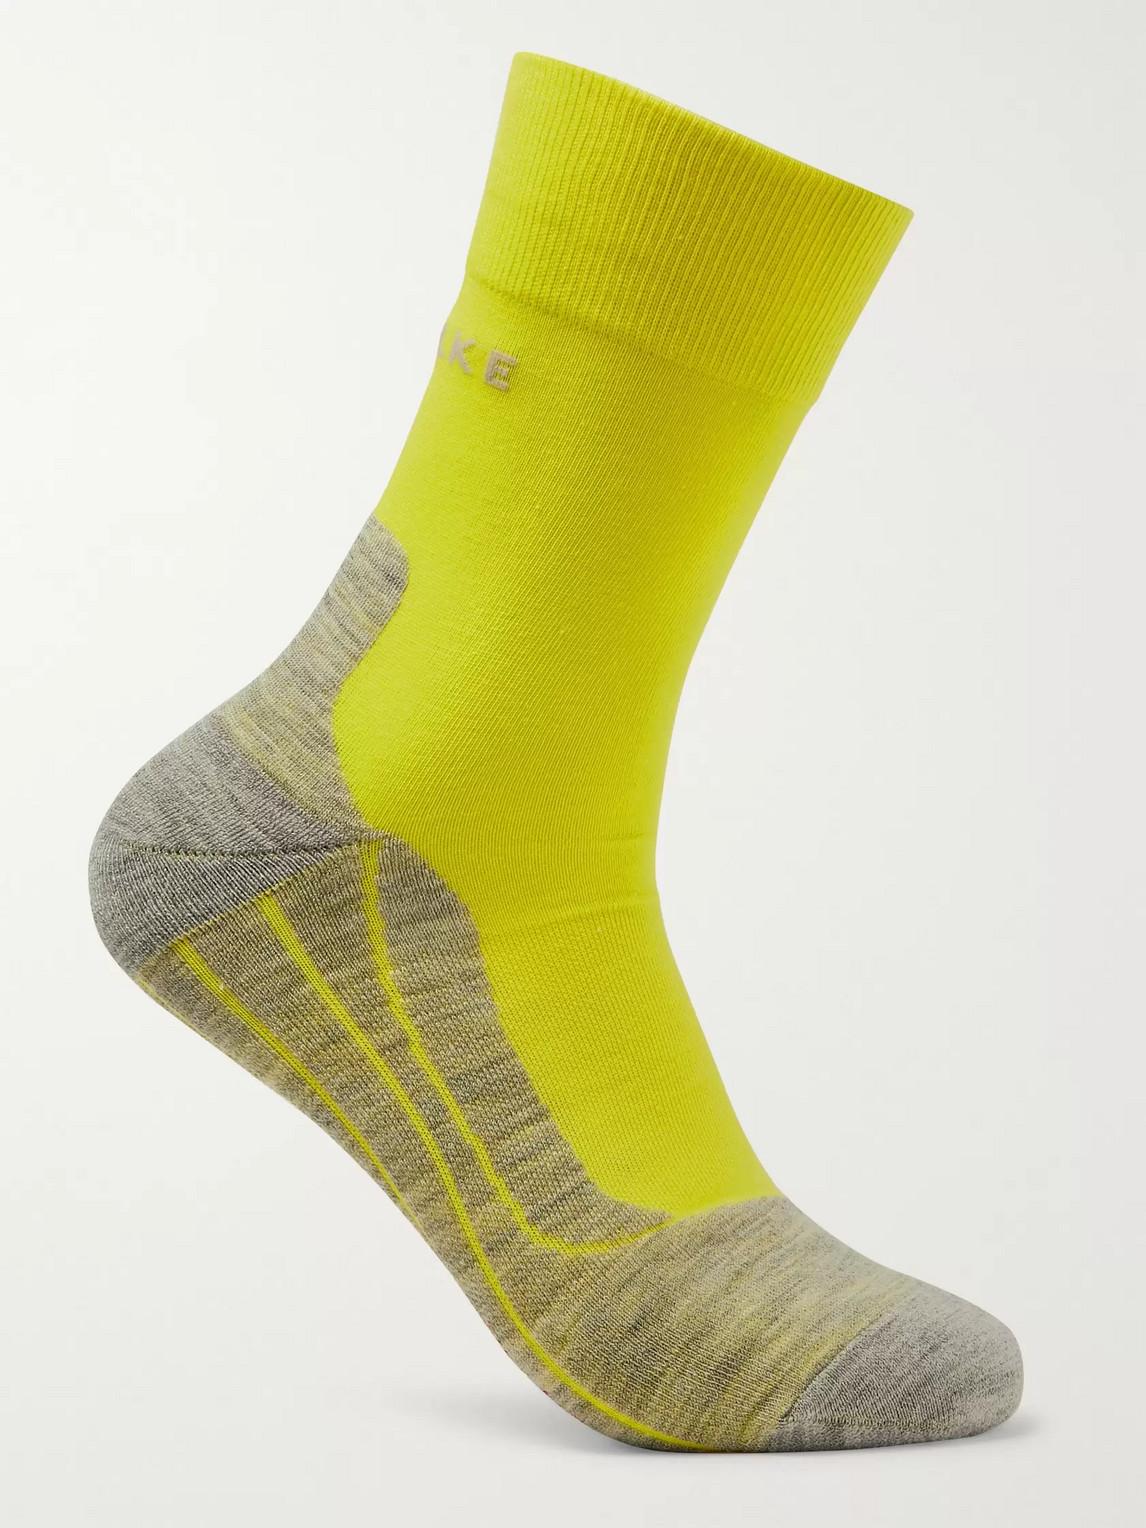 falke ergonomic sport system - ru4 stretch-knit socks - men - yellow